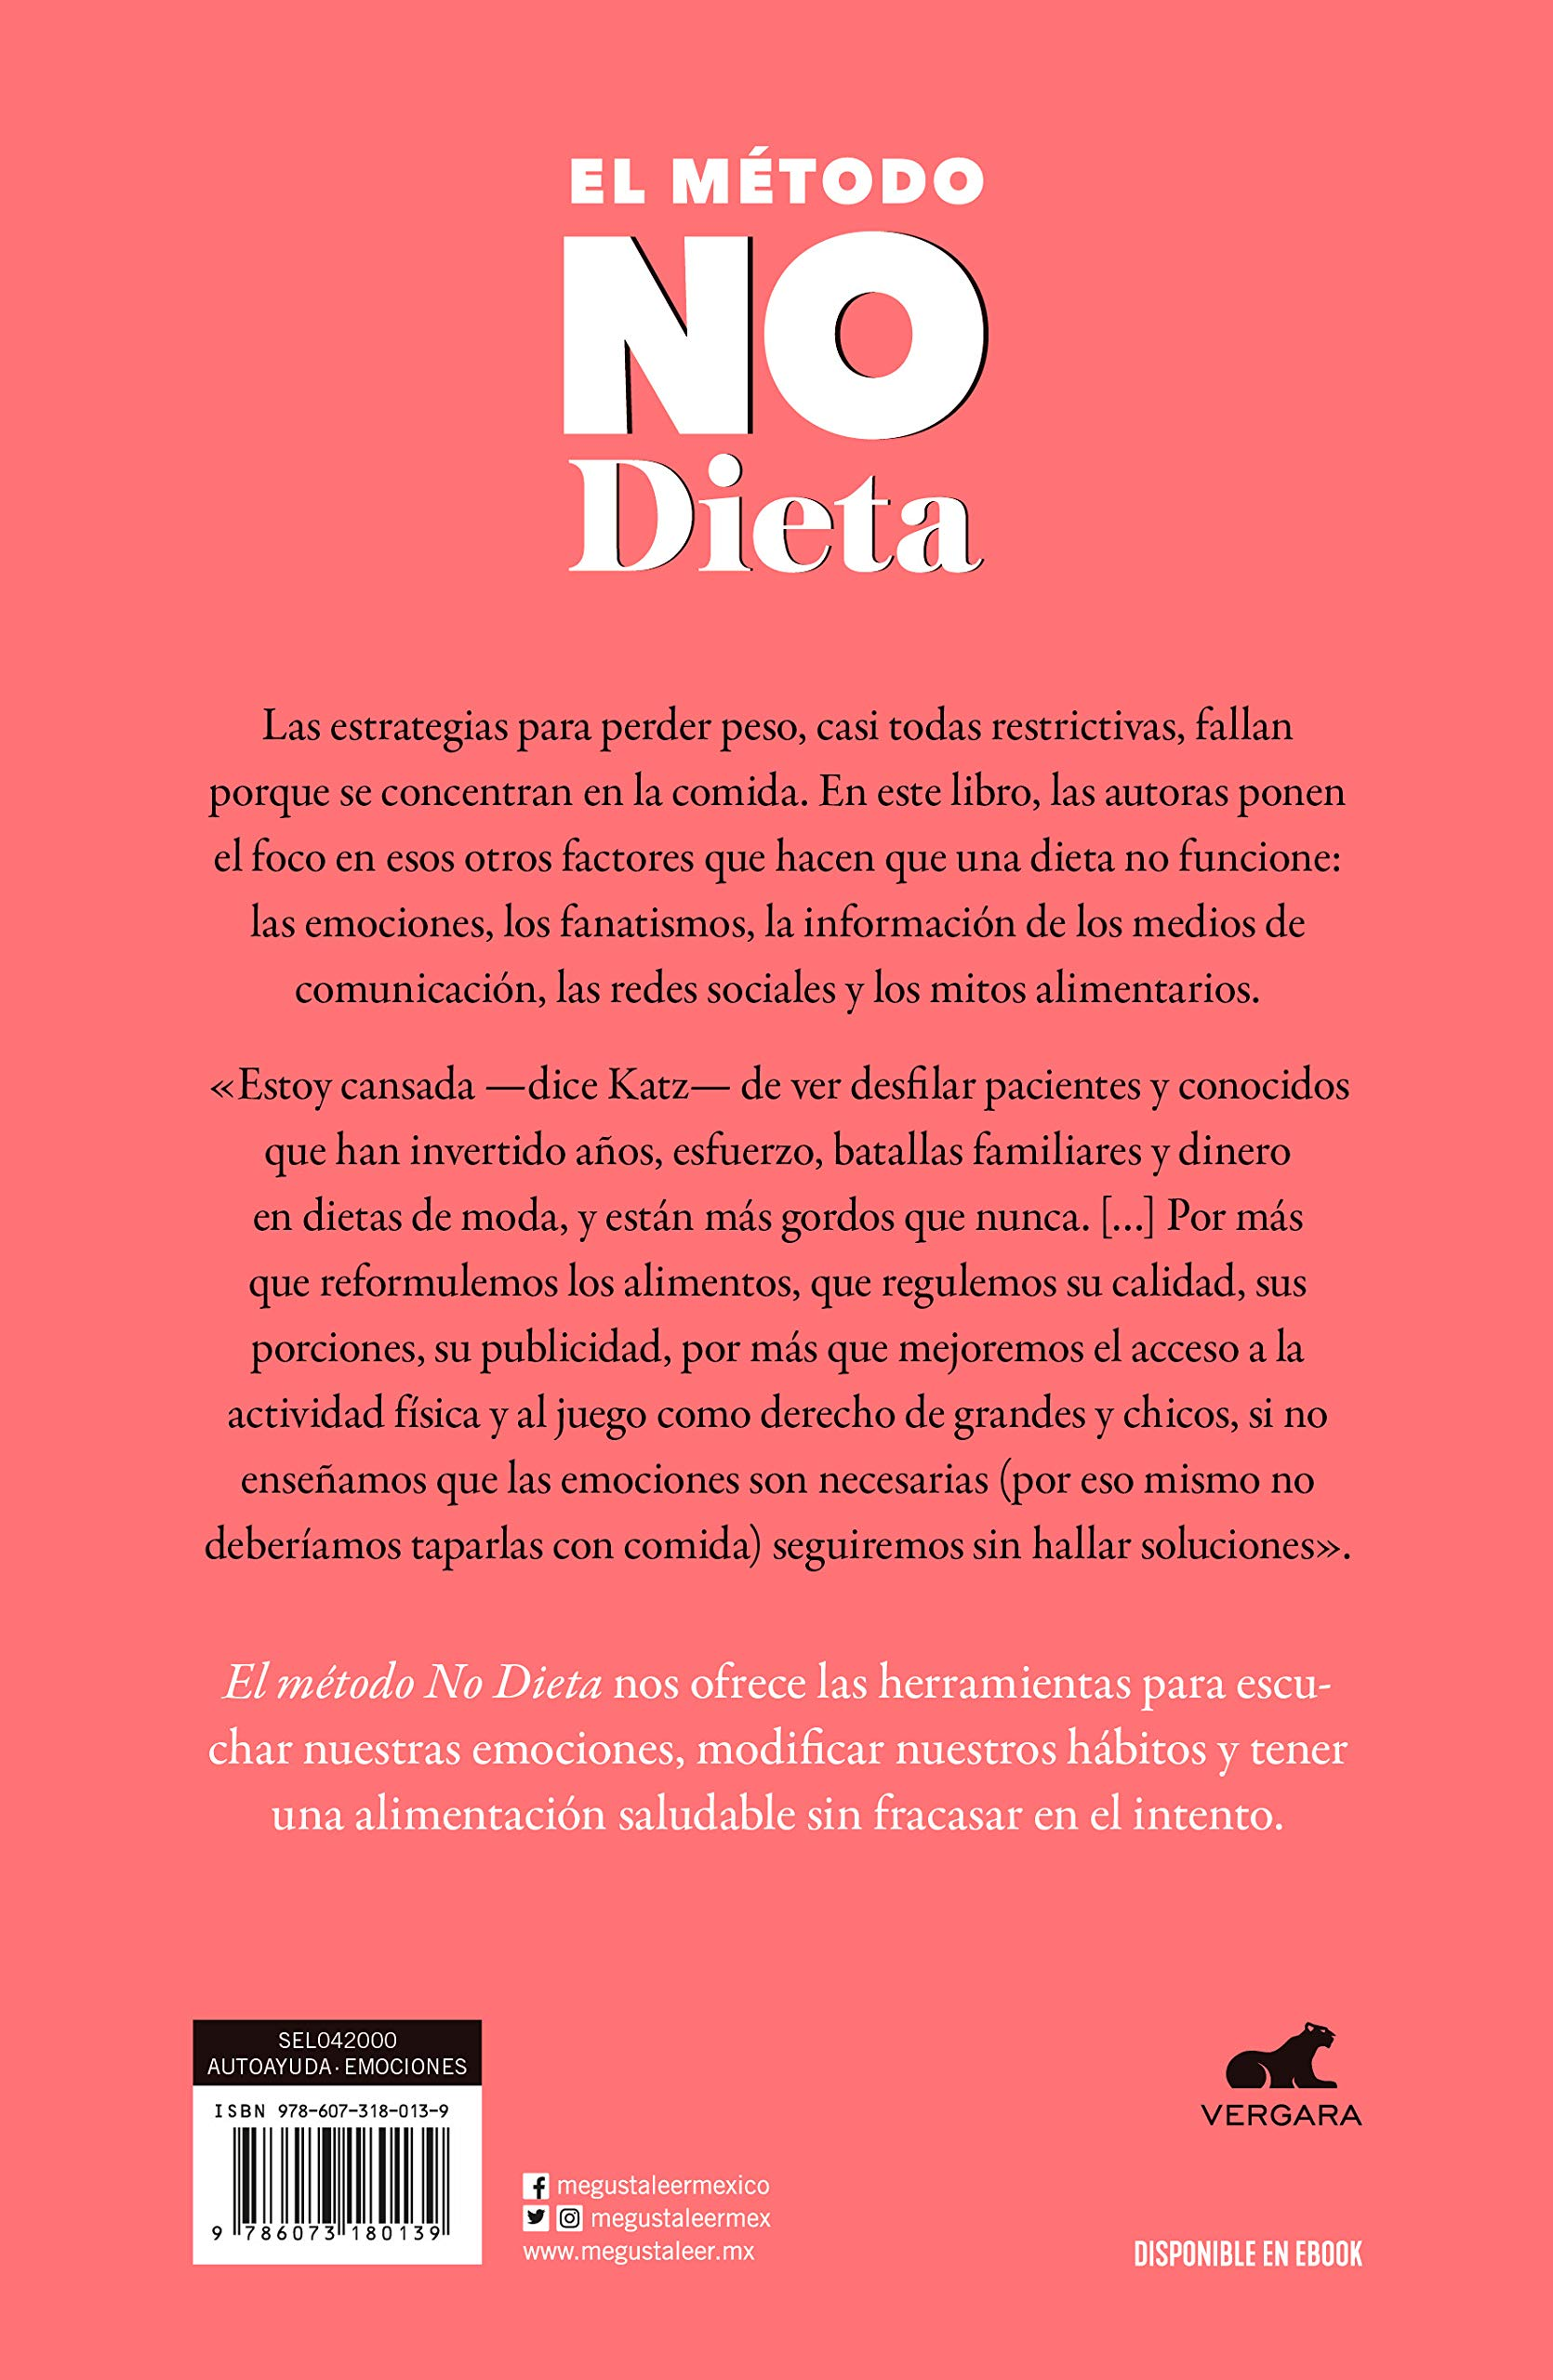 metodo no diet libro monica katz